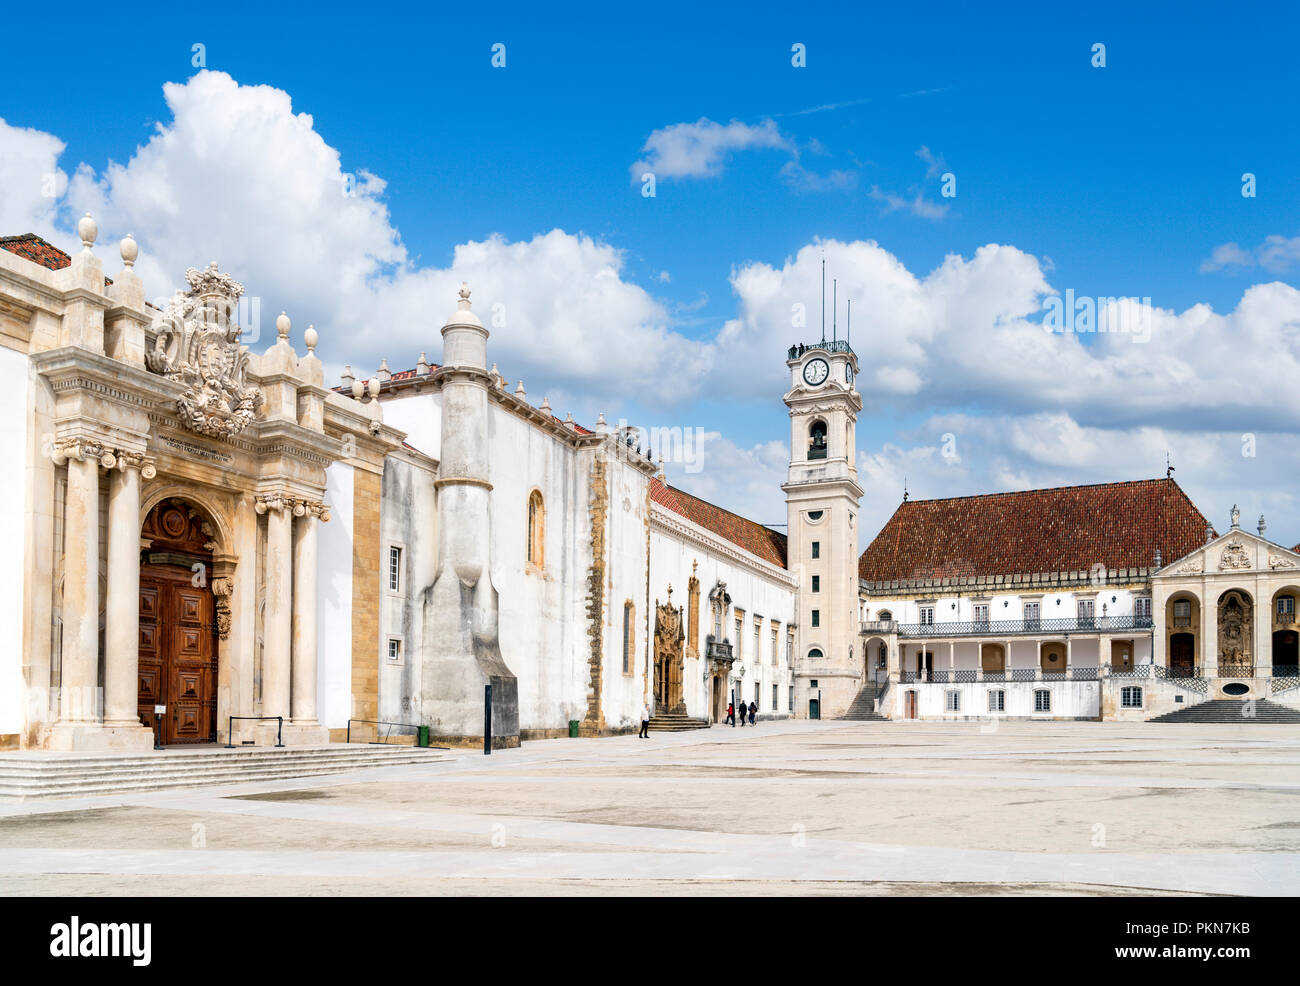 Coimbra University. Paço das Escolas, the Old University (Velha Universidade), Coimbra, Portugal - Stock Image